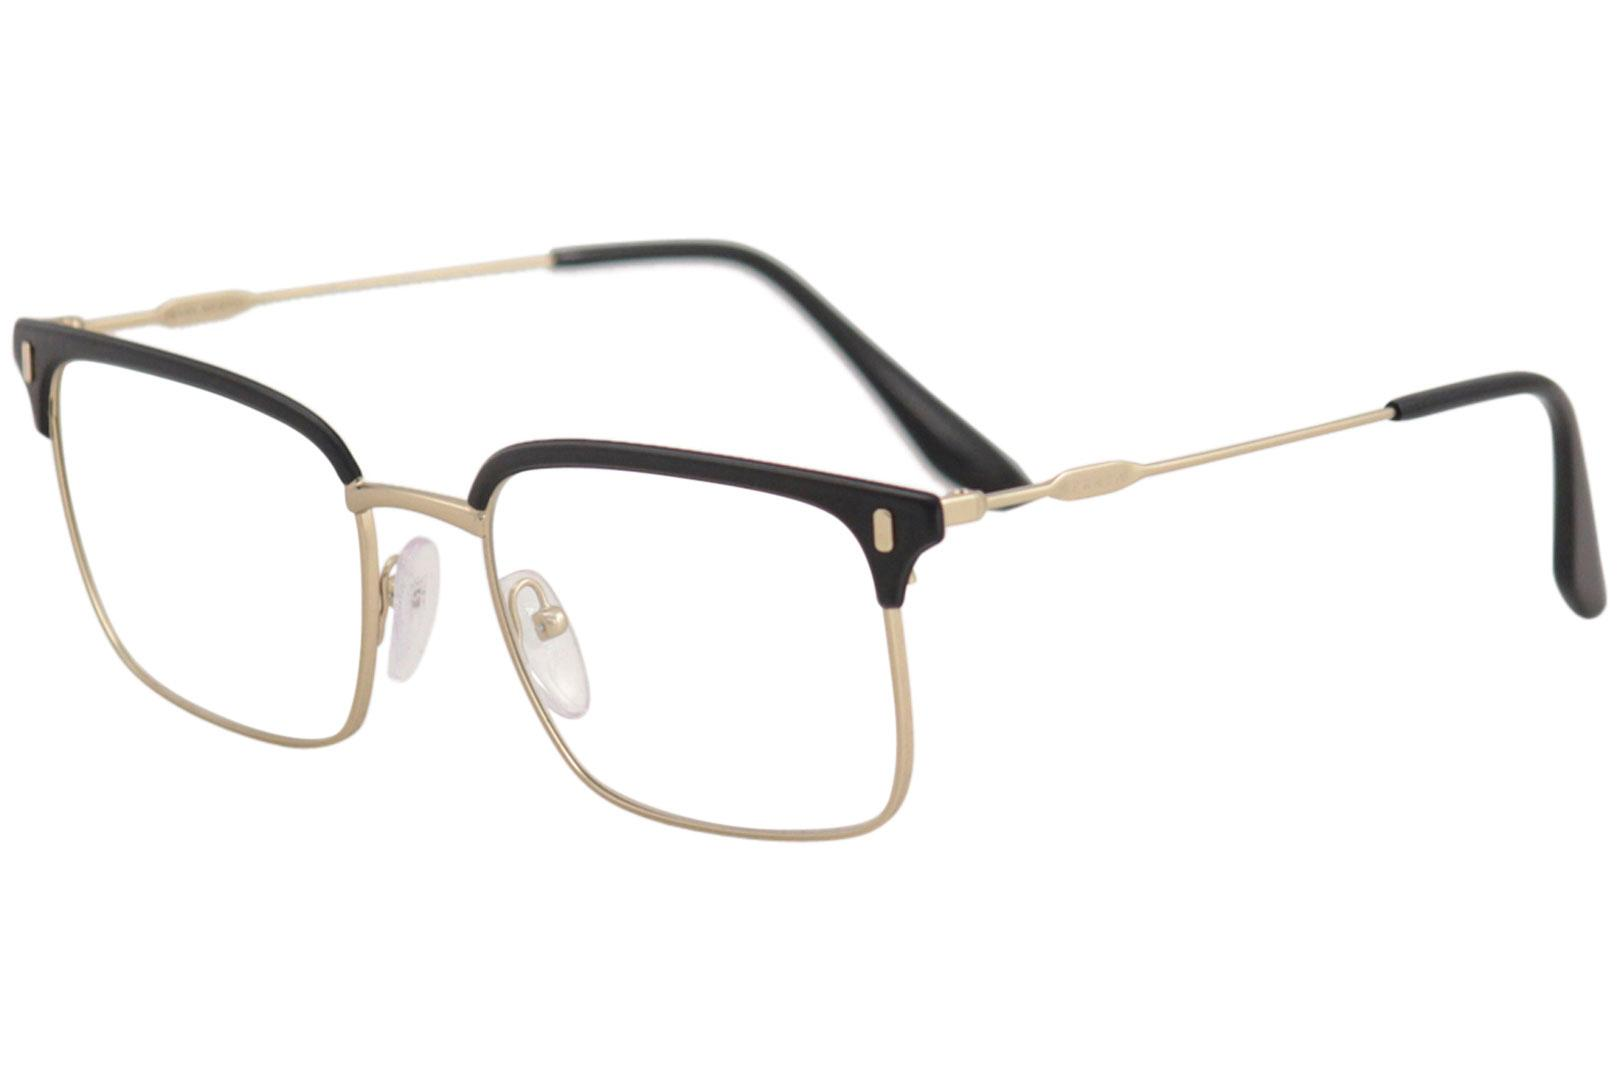 38db06c5cab4 Prada Eyeglasses VPR55V VPR 55 V 280 1O1 Matte Gold Black Optical ...